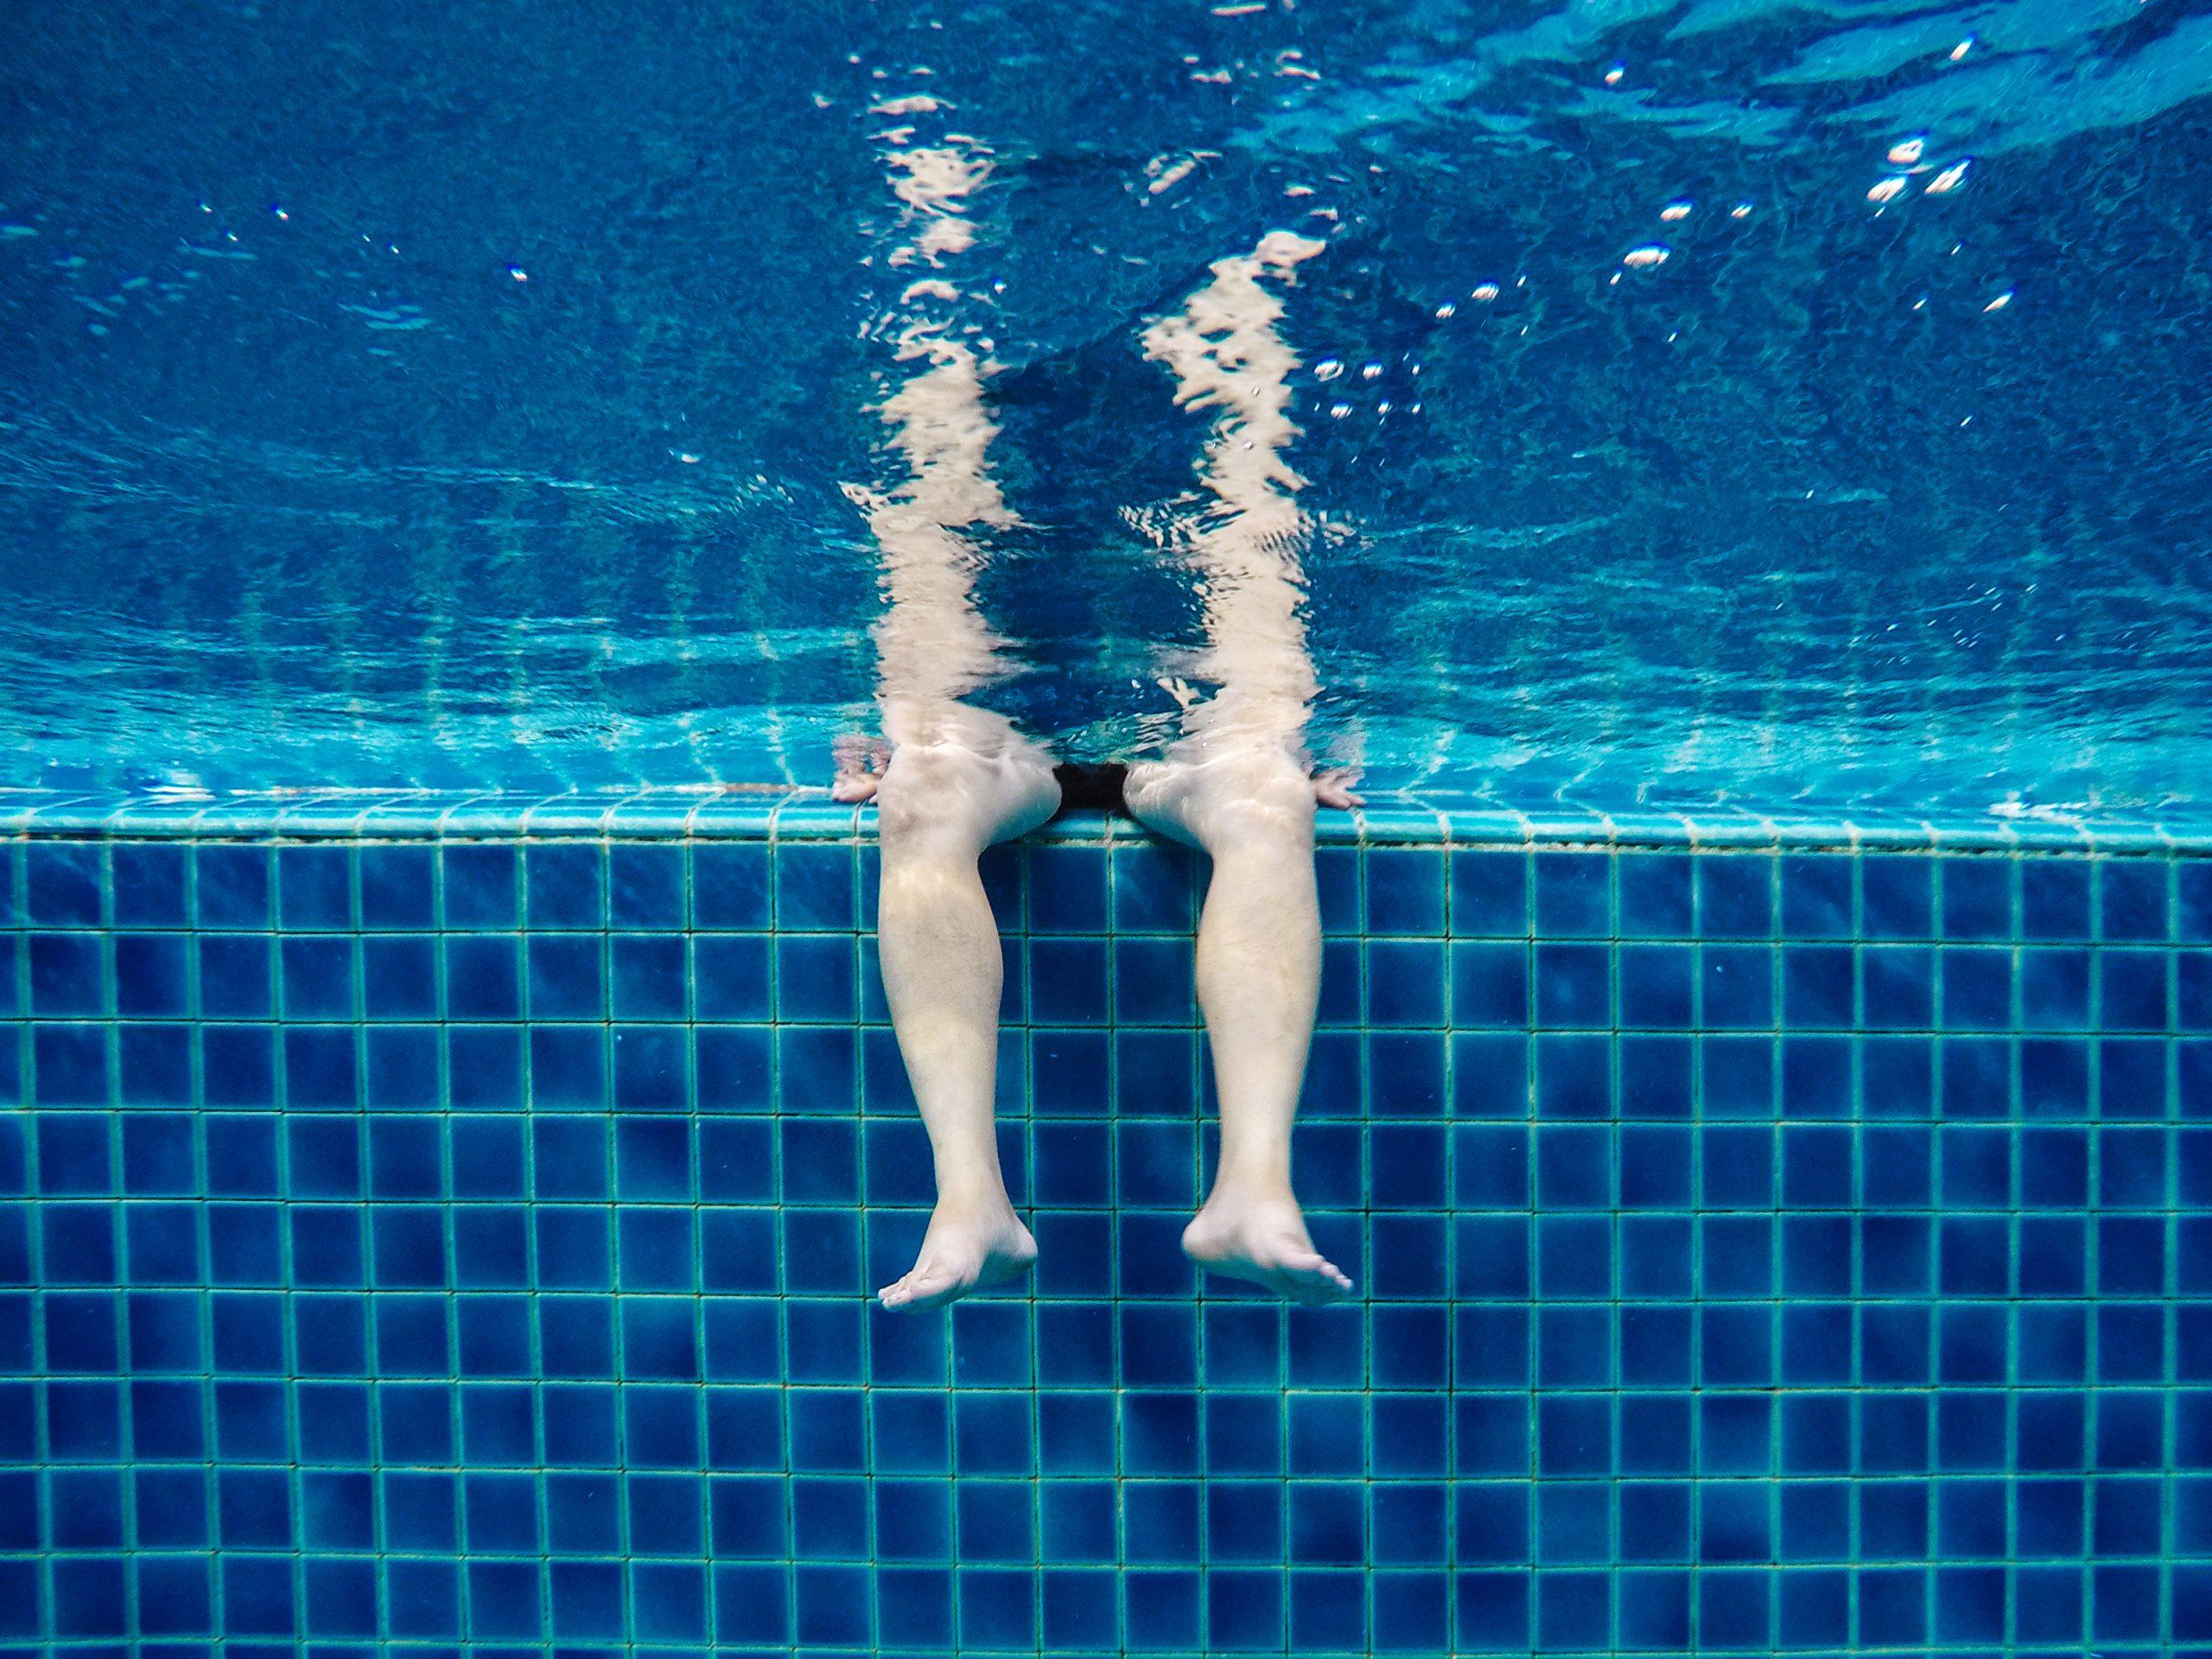 Aquaphobie – Ingréo – Montauban – Vert-Marine intérieur Piscine Ingreo Montauban